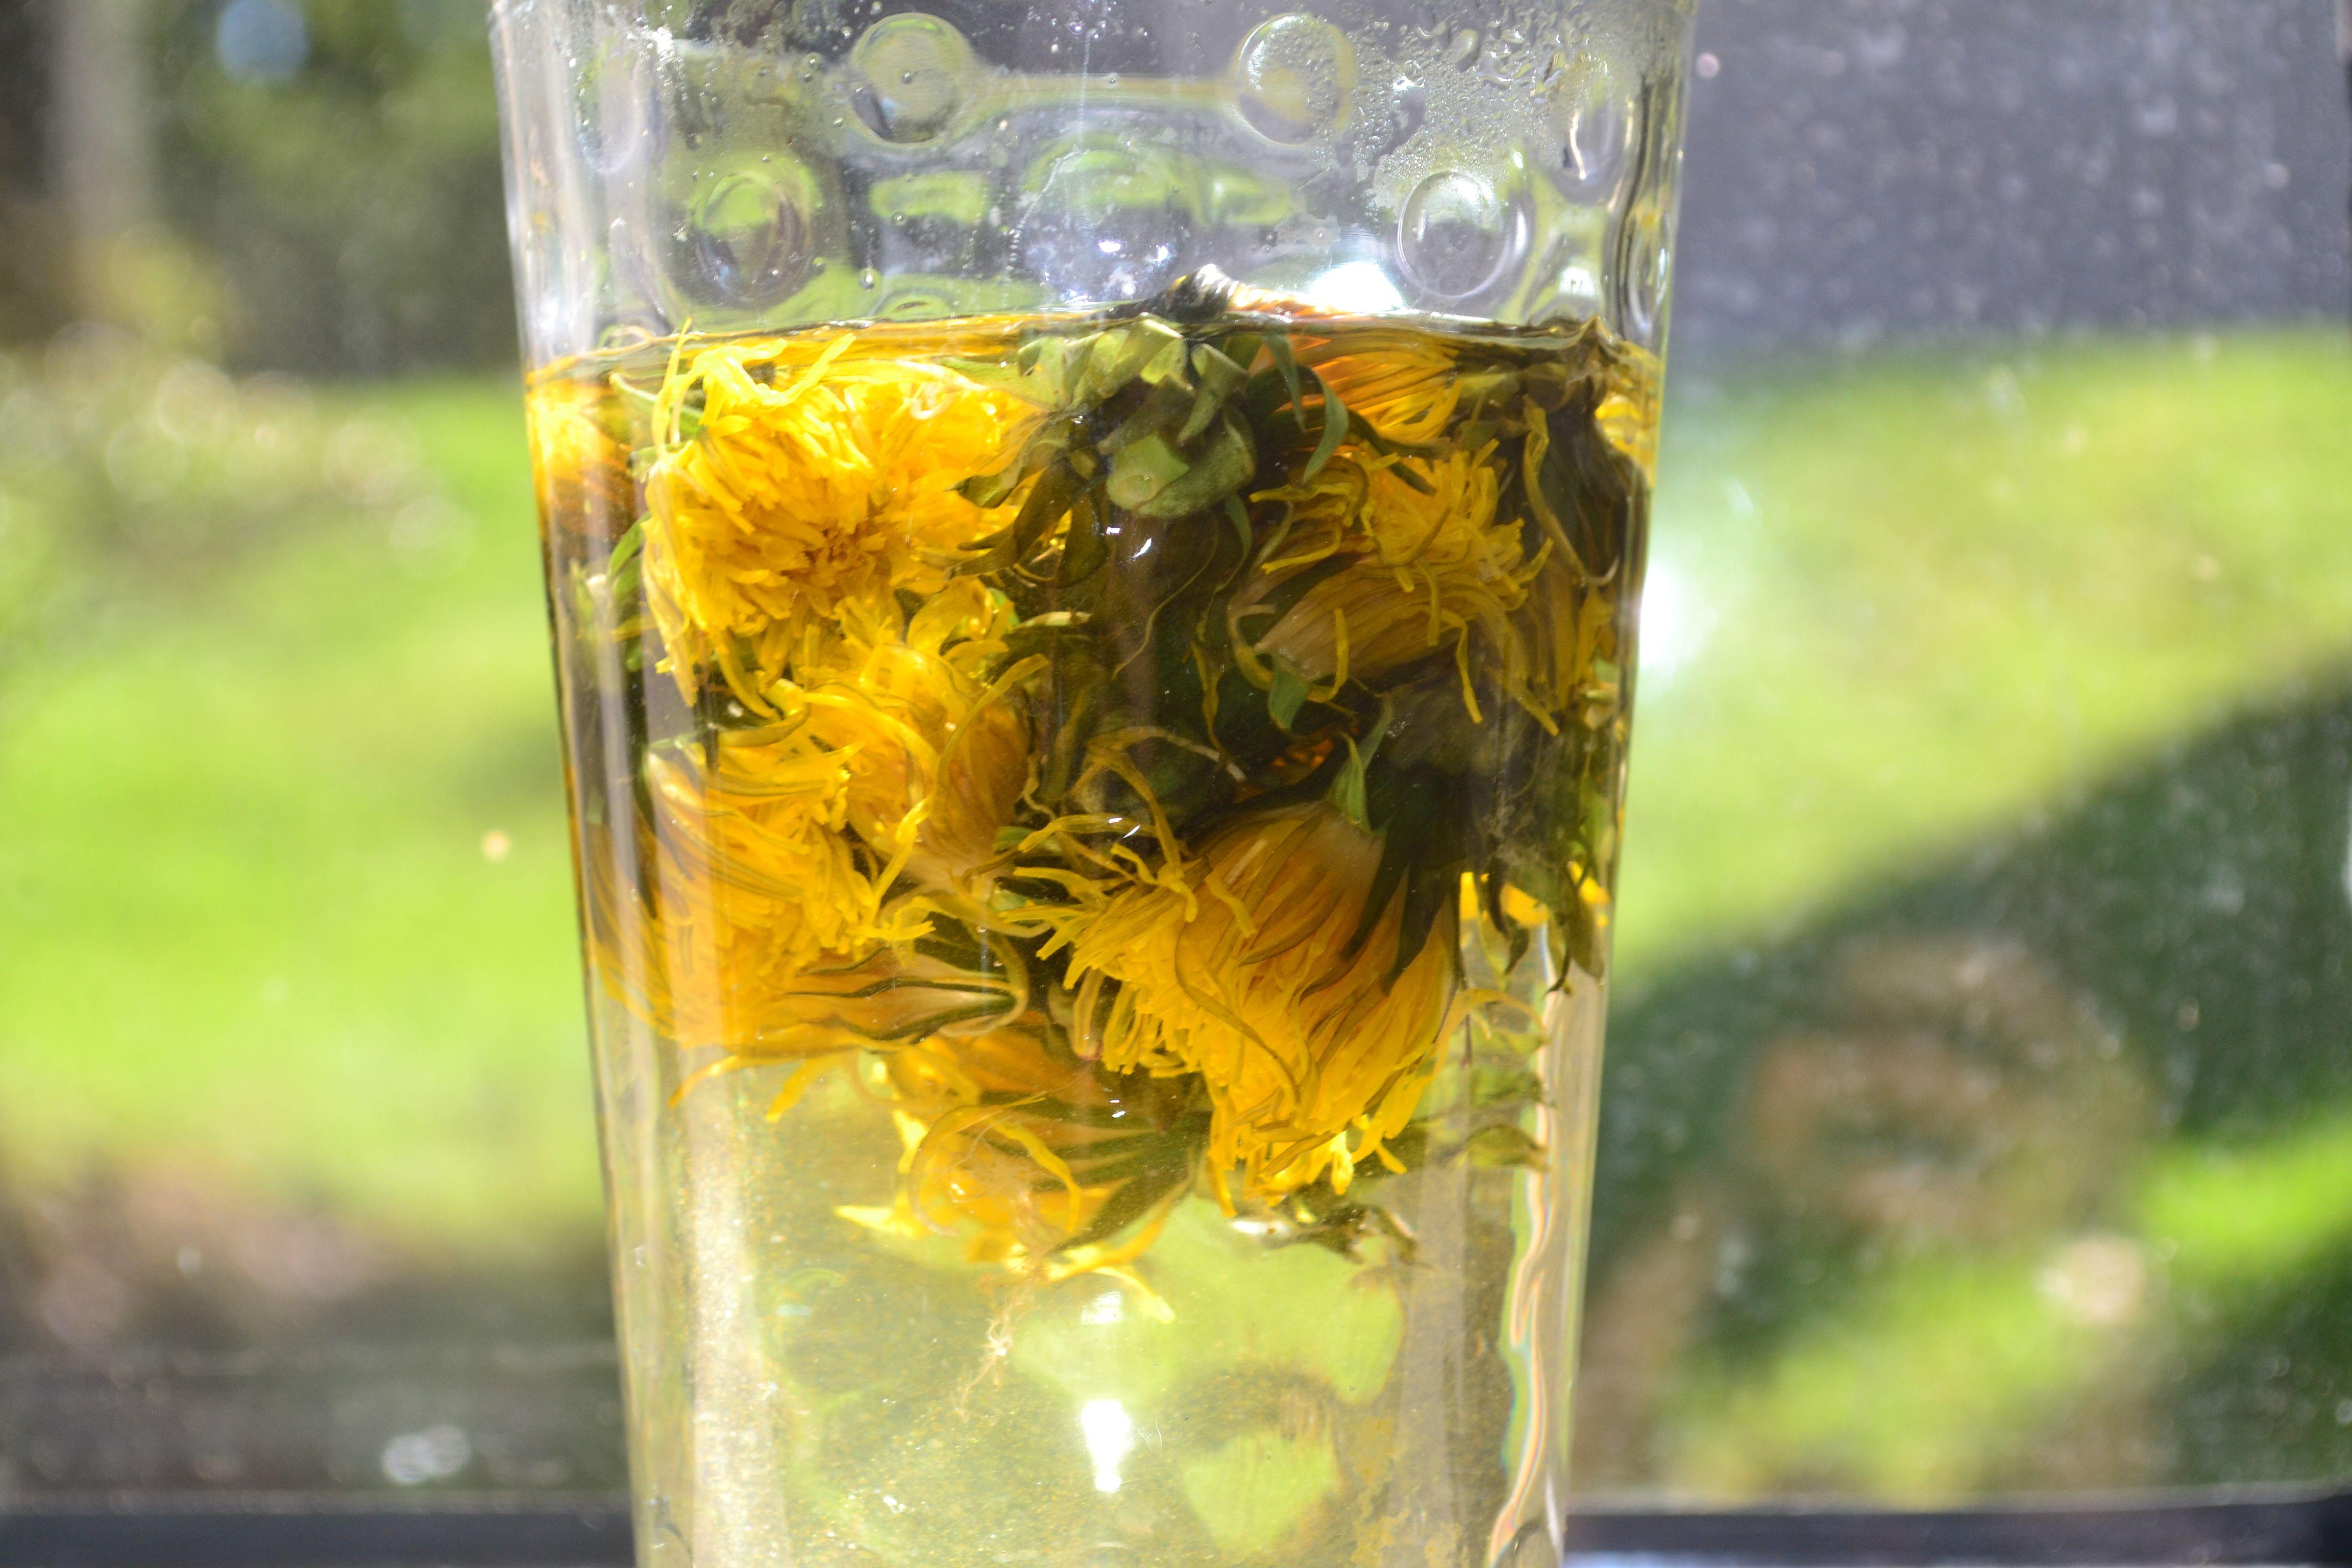 How To Make Dandelion Tea 3 Ways Dedicated To Earth Day Dandelion Tea Dandelion Root Tea How To Make Tea